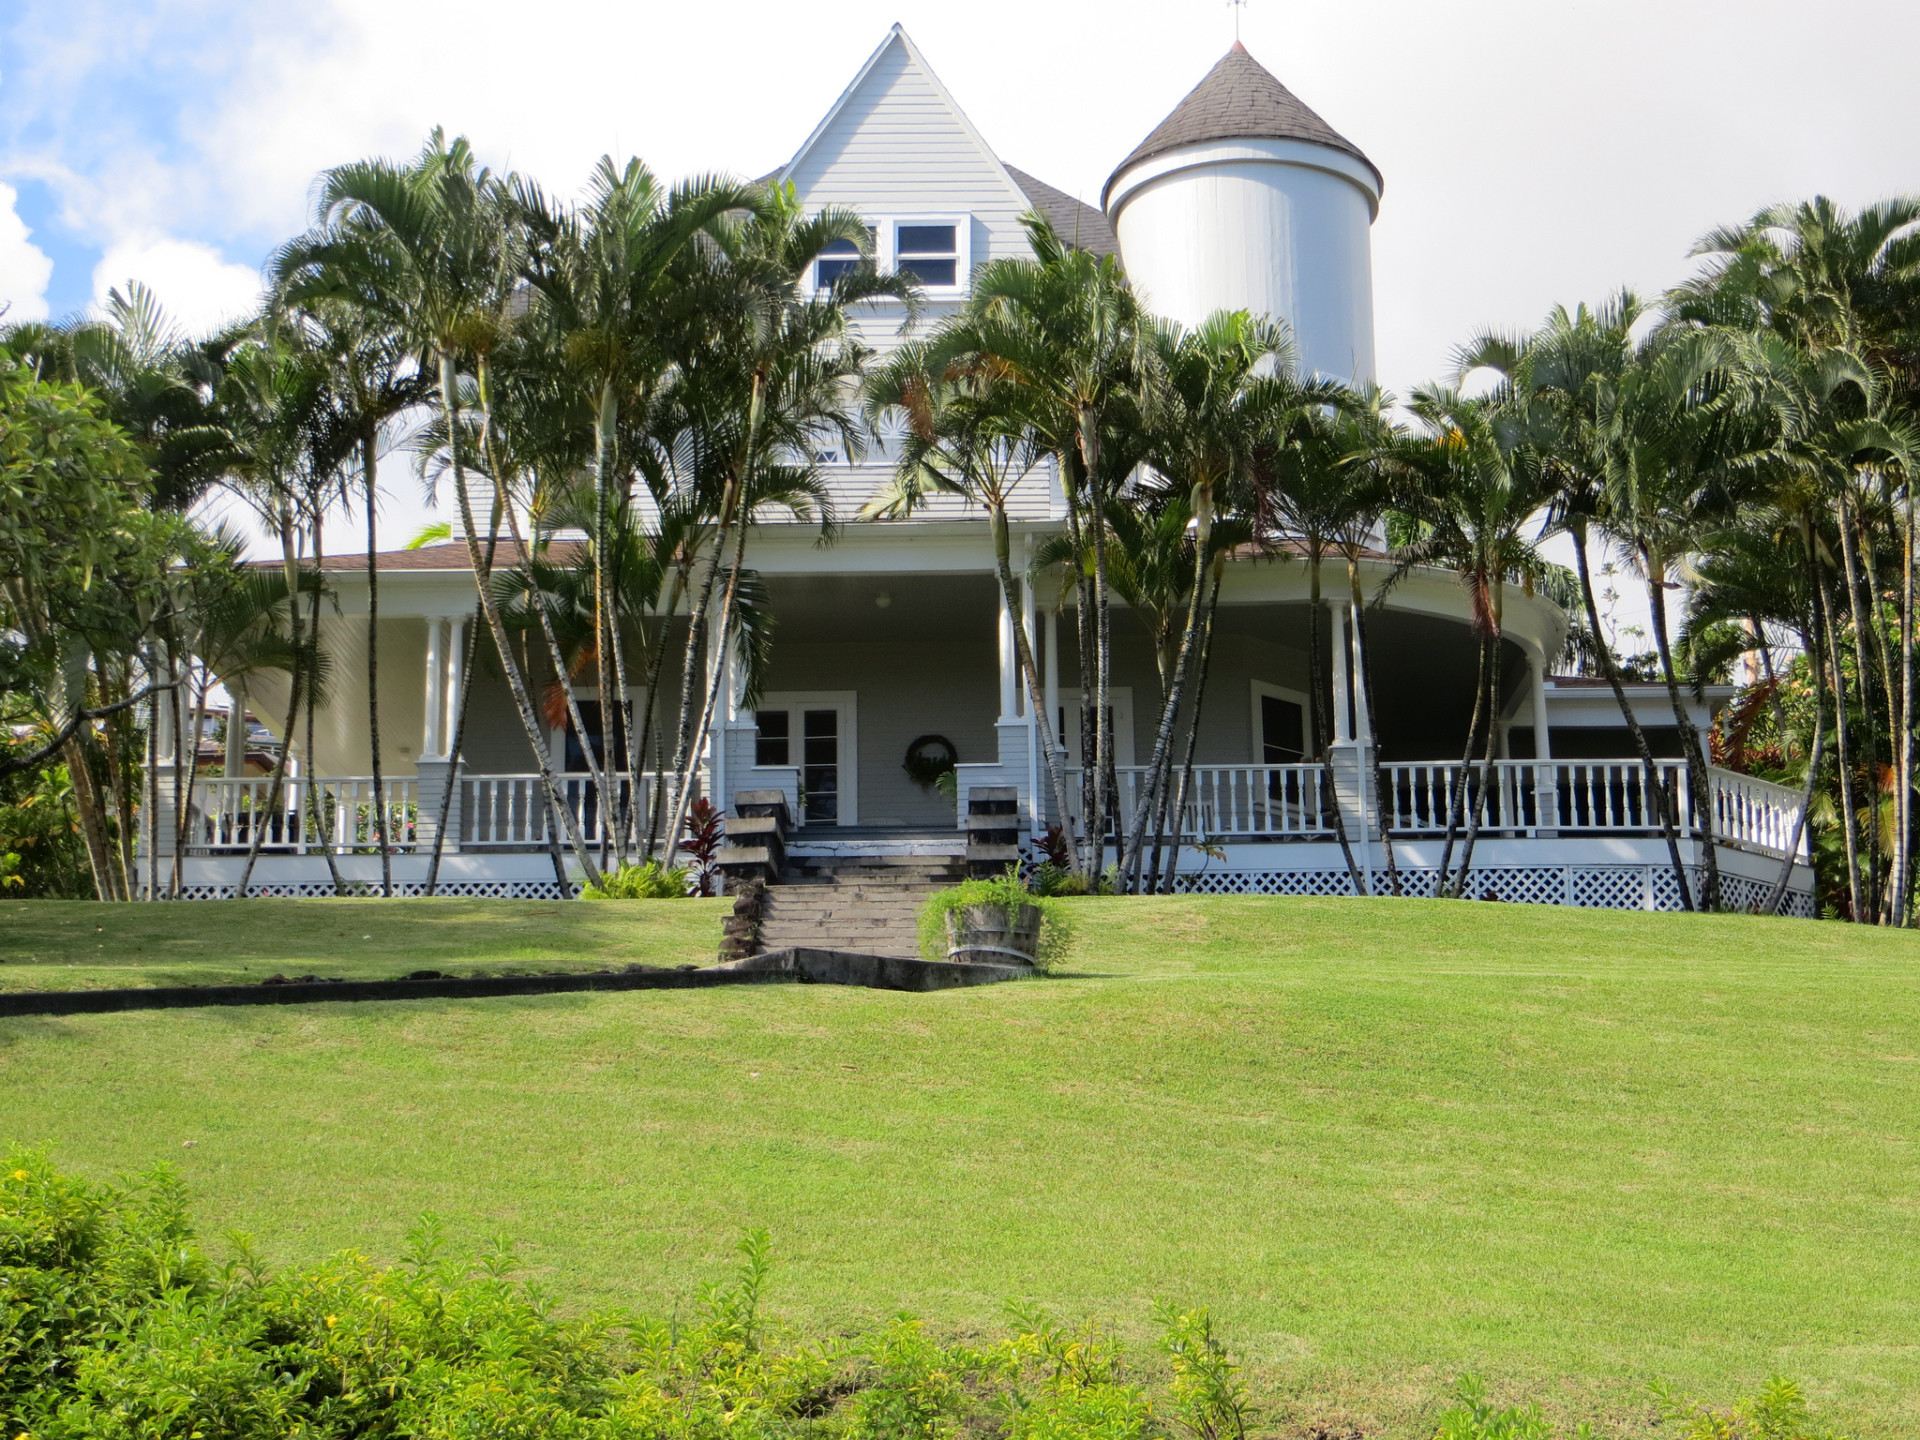 2911 Pacific Heights Road/ Joseph Pratt House - Historic